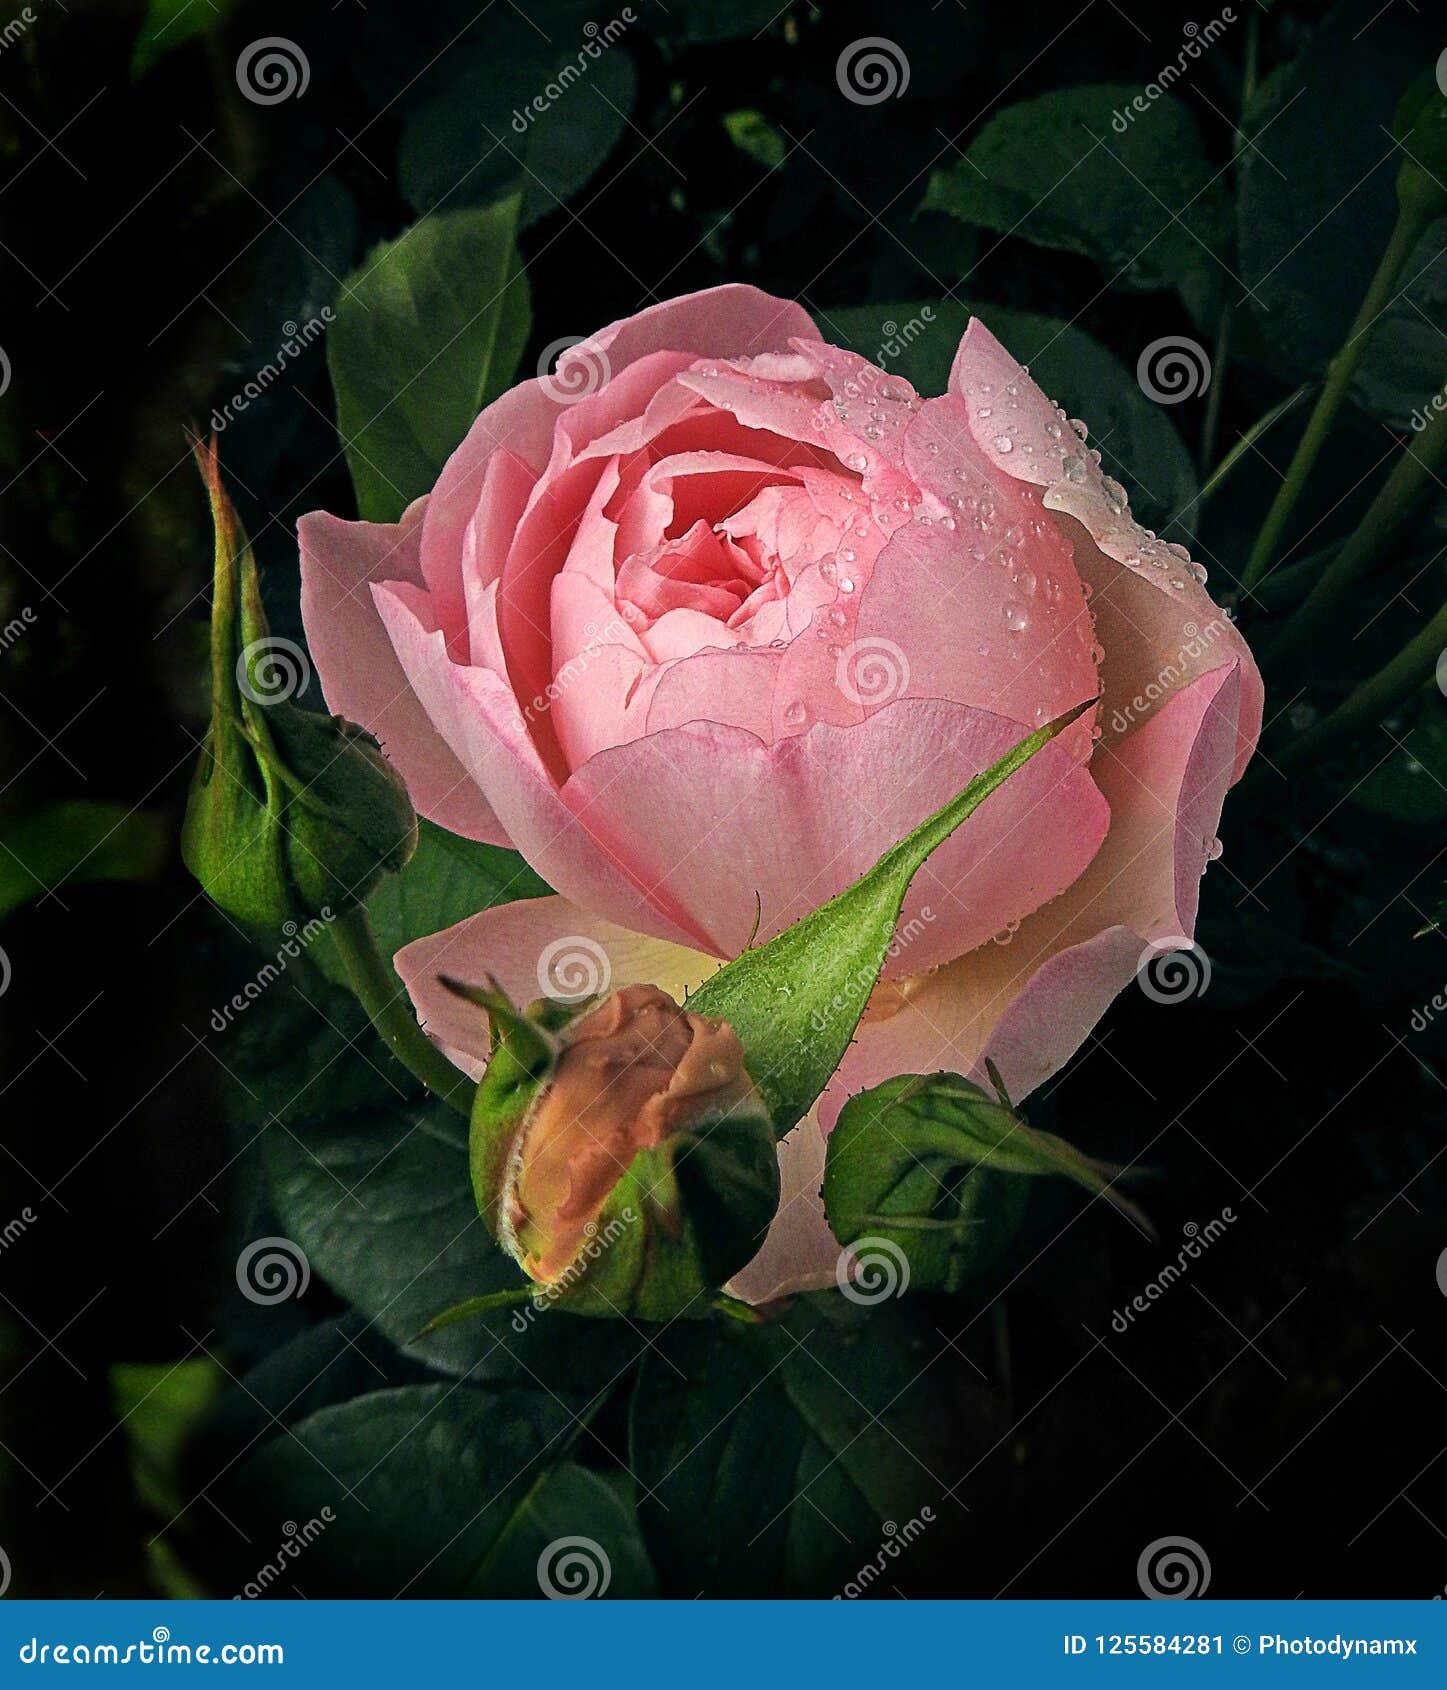 Renaissance peony rose after the rainfall